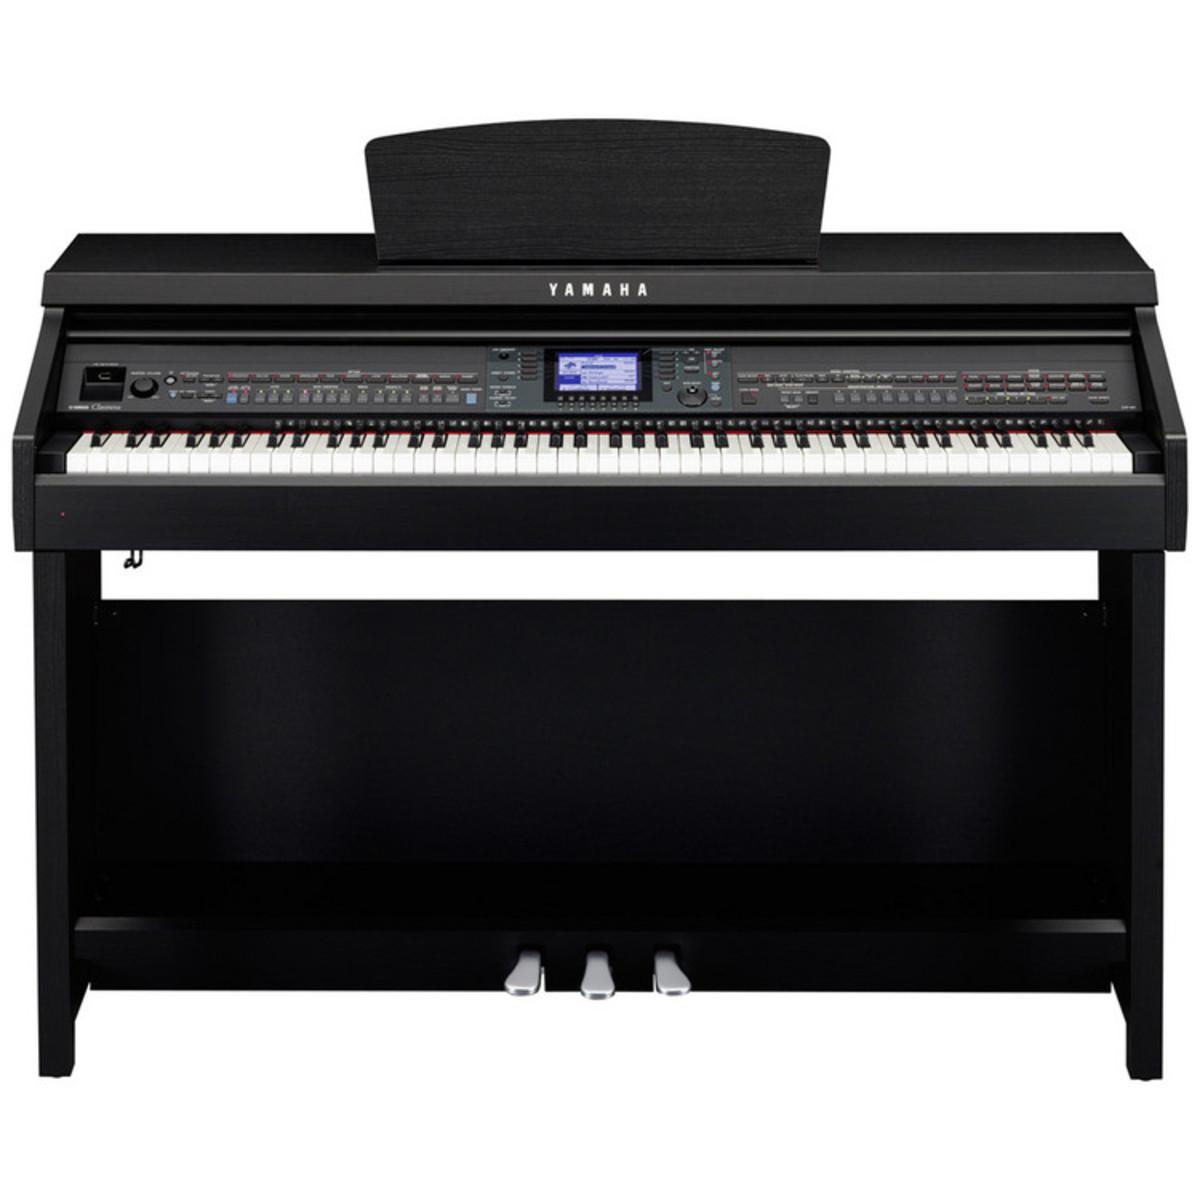 Yamaha clavinova cvp601 piano digital nogal negro en for Yamaha clavinova clp 110